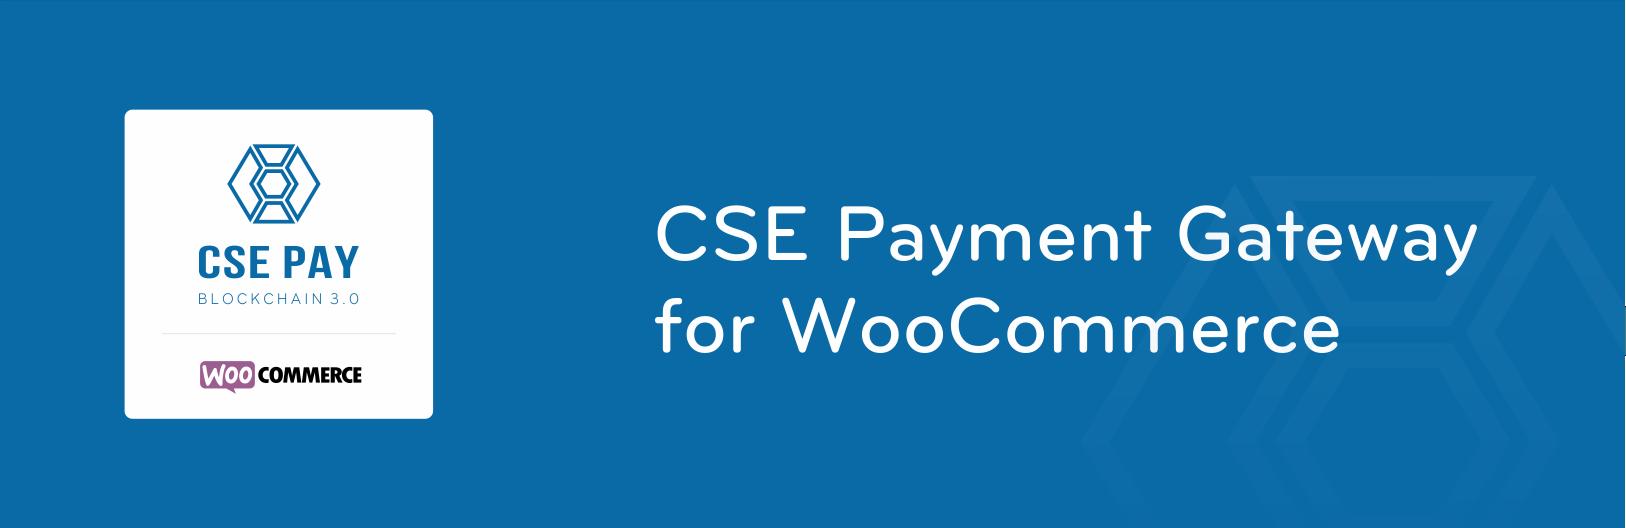 WooCommerce cse payment gateway